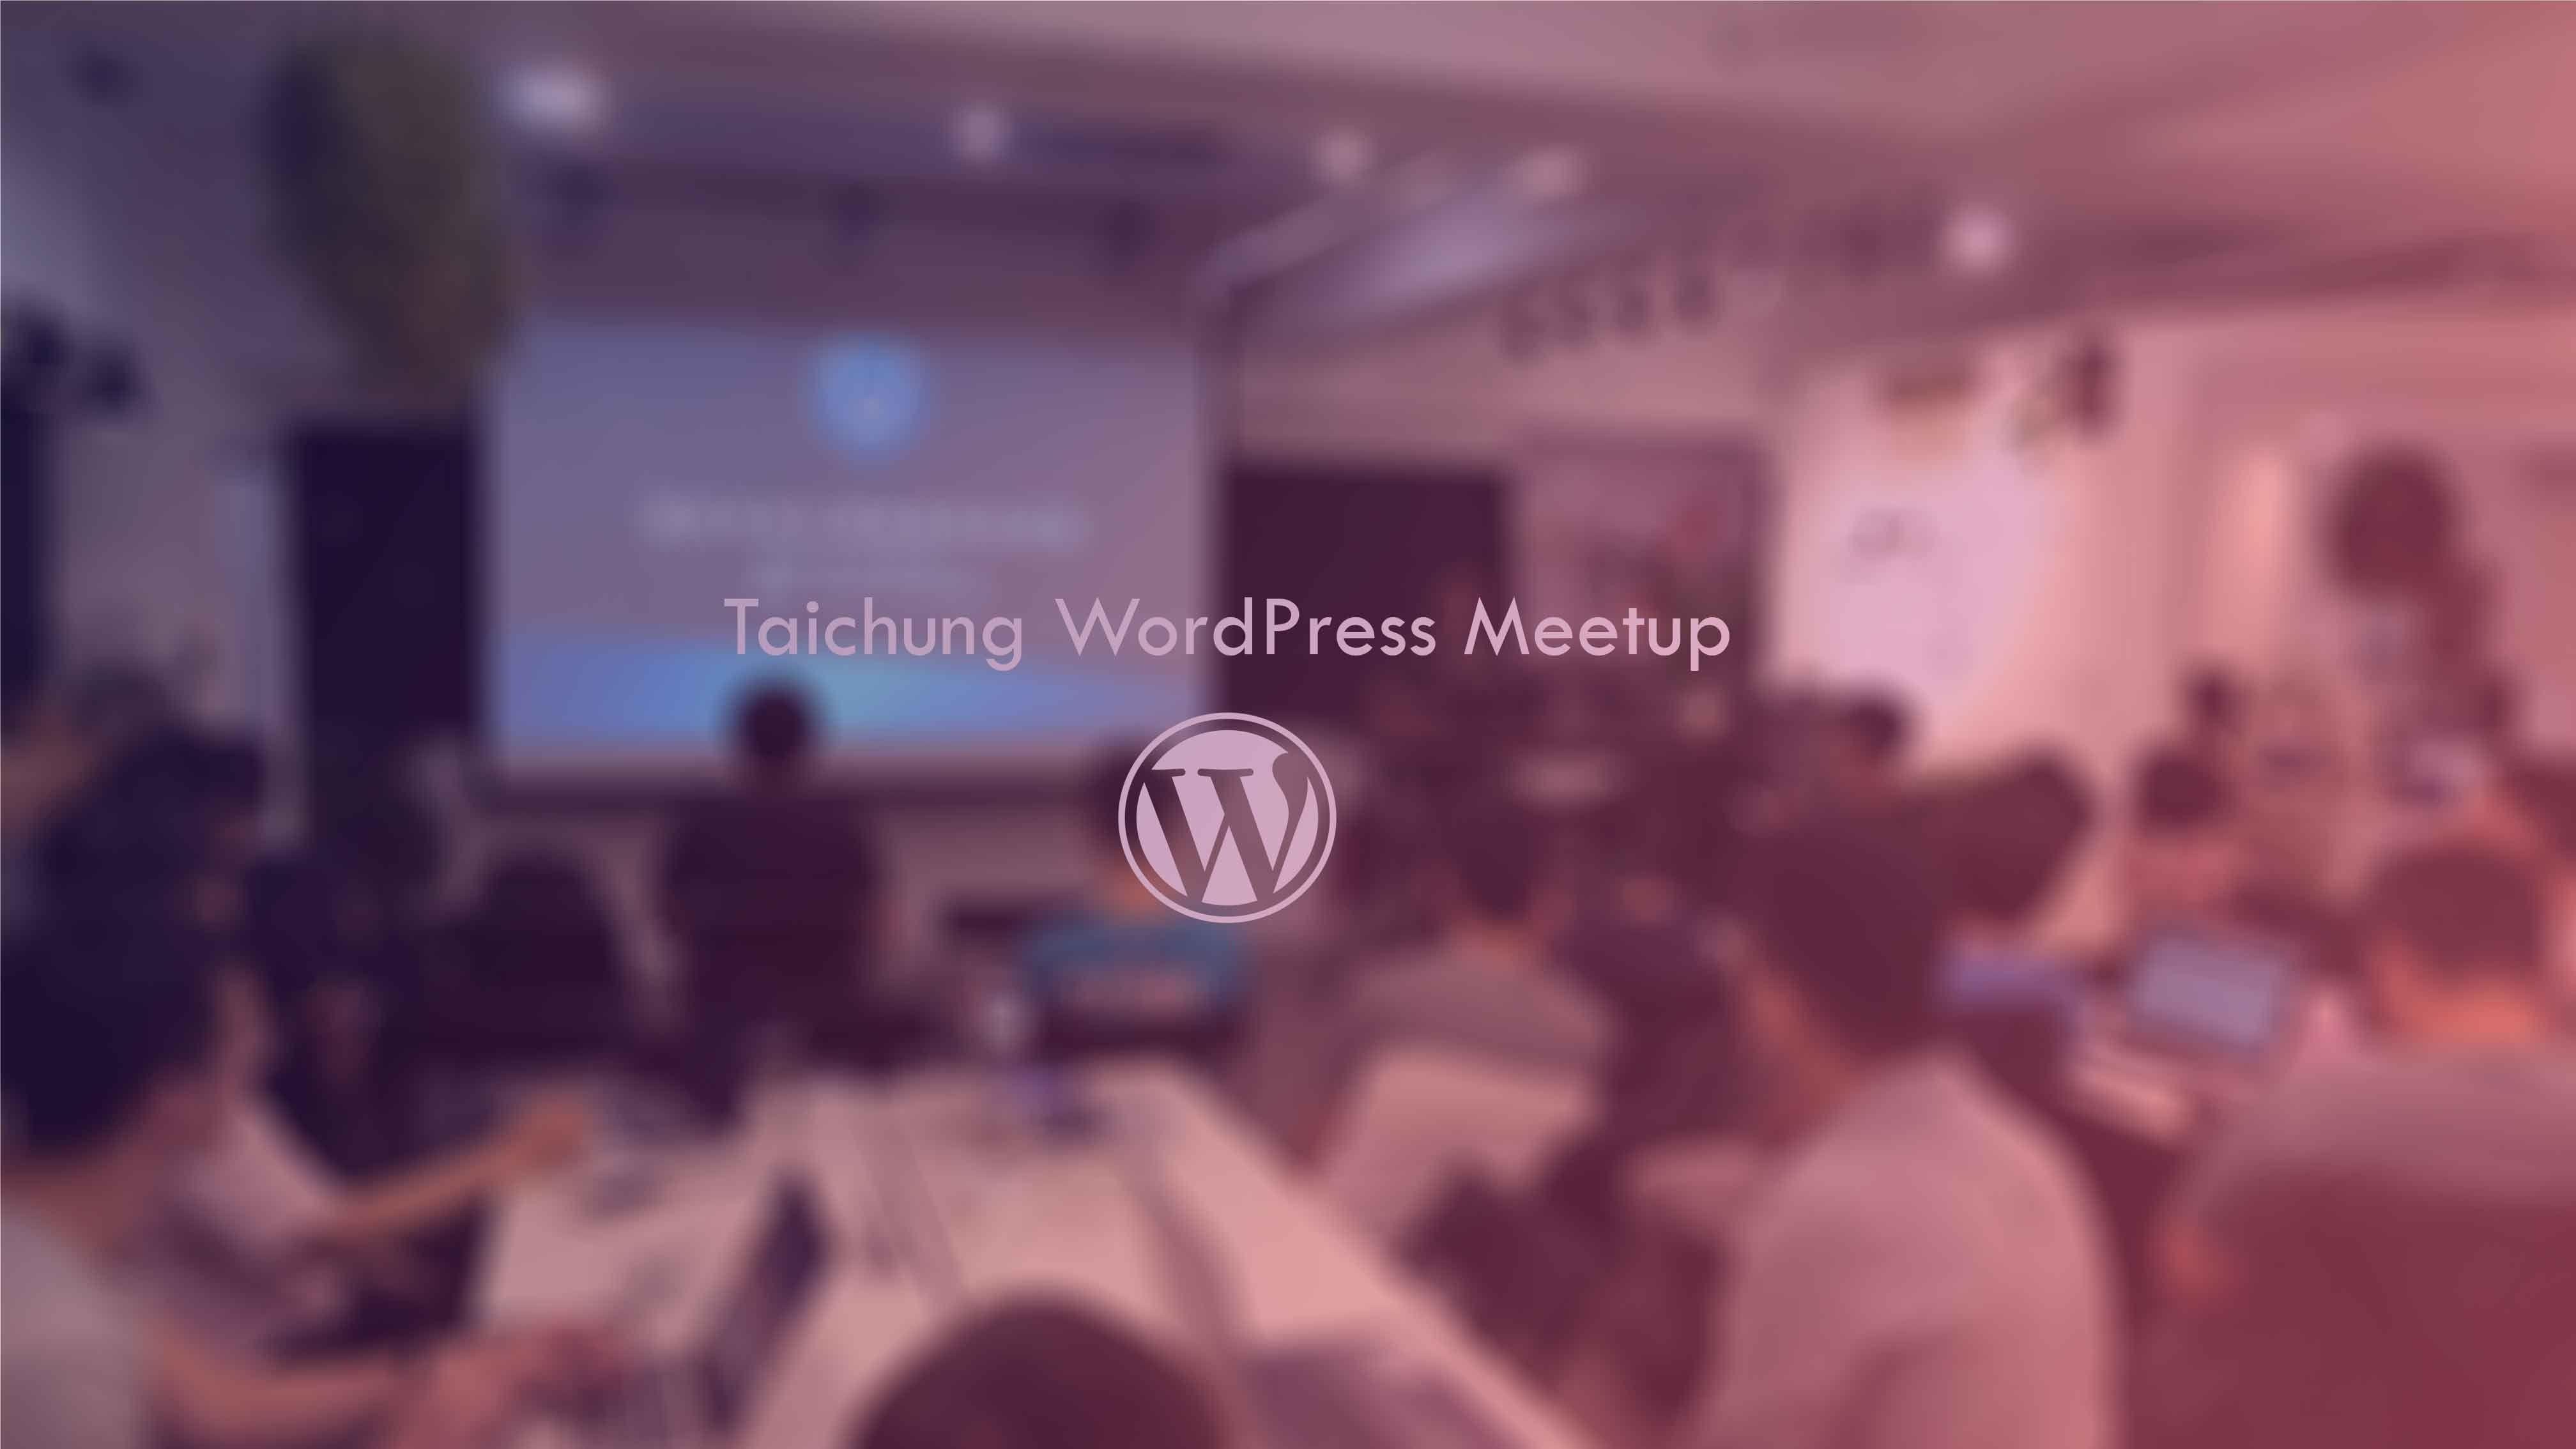 Taichung WordPress Meetup